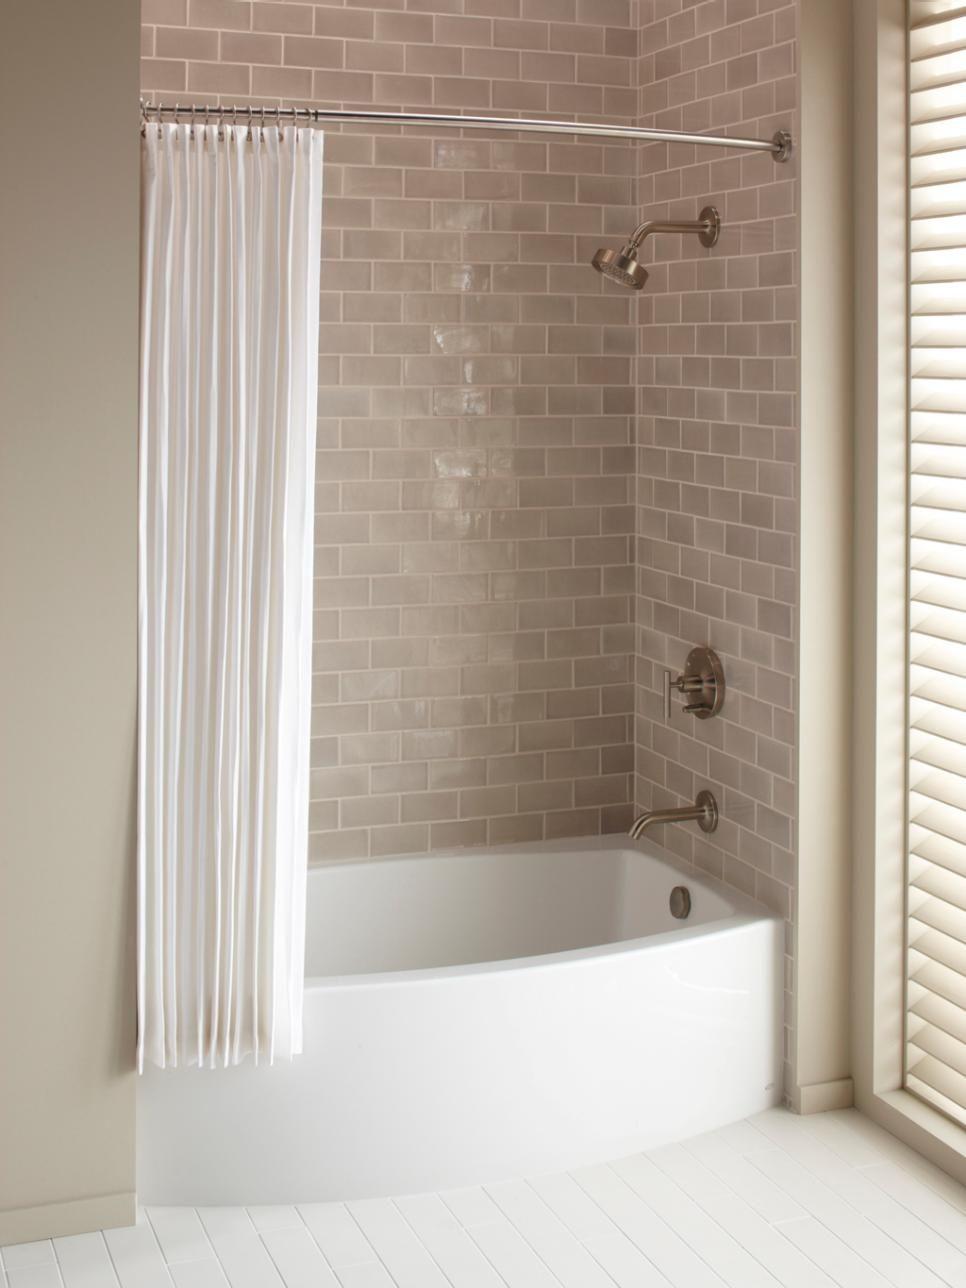 Cheap vs. Steep: Bathtubs | Pinterest | Bath remodel, Bathtubs and ...